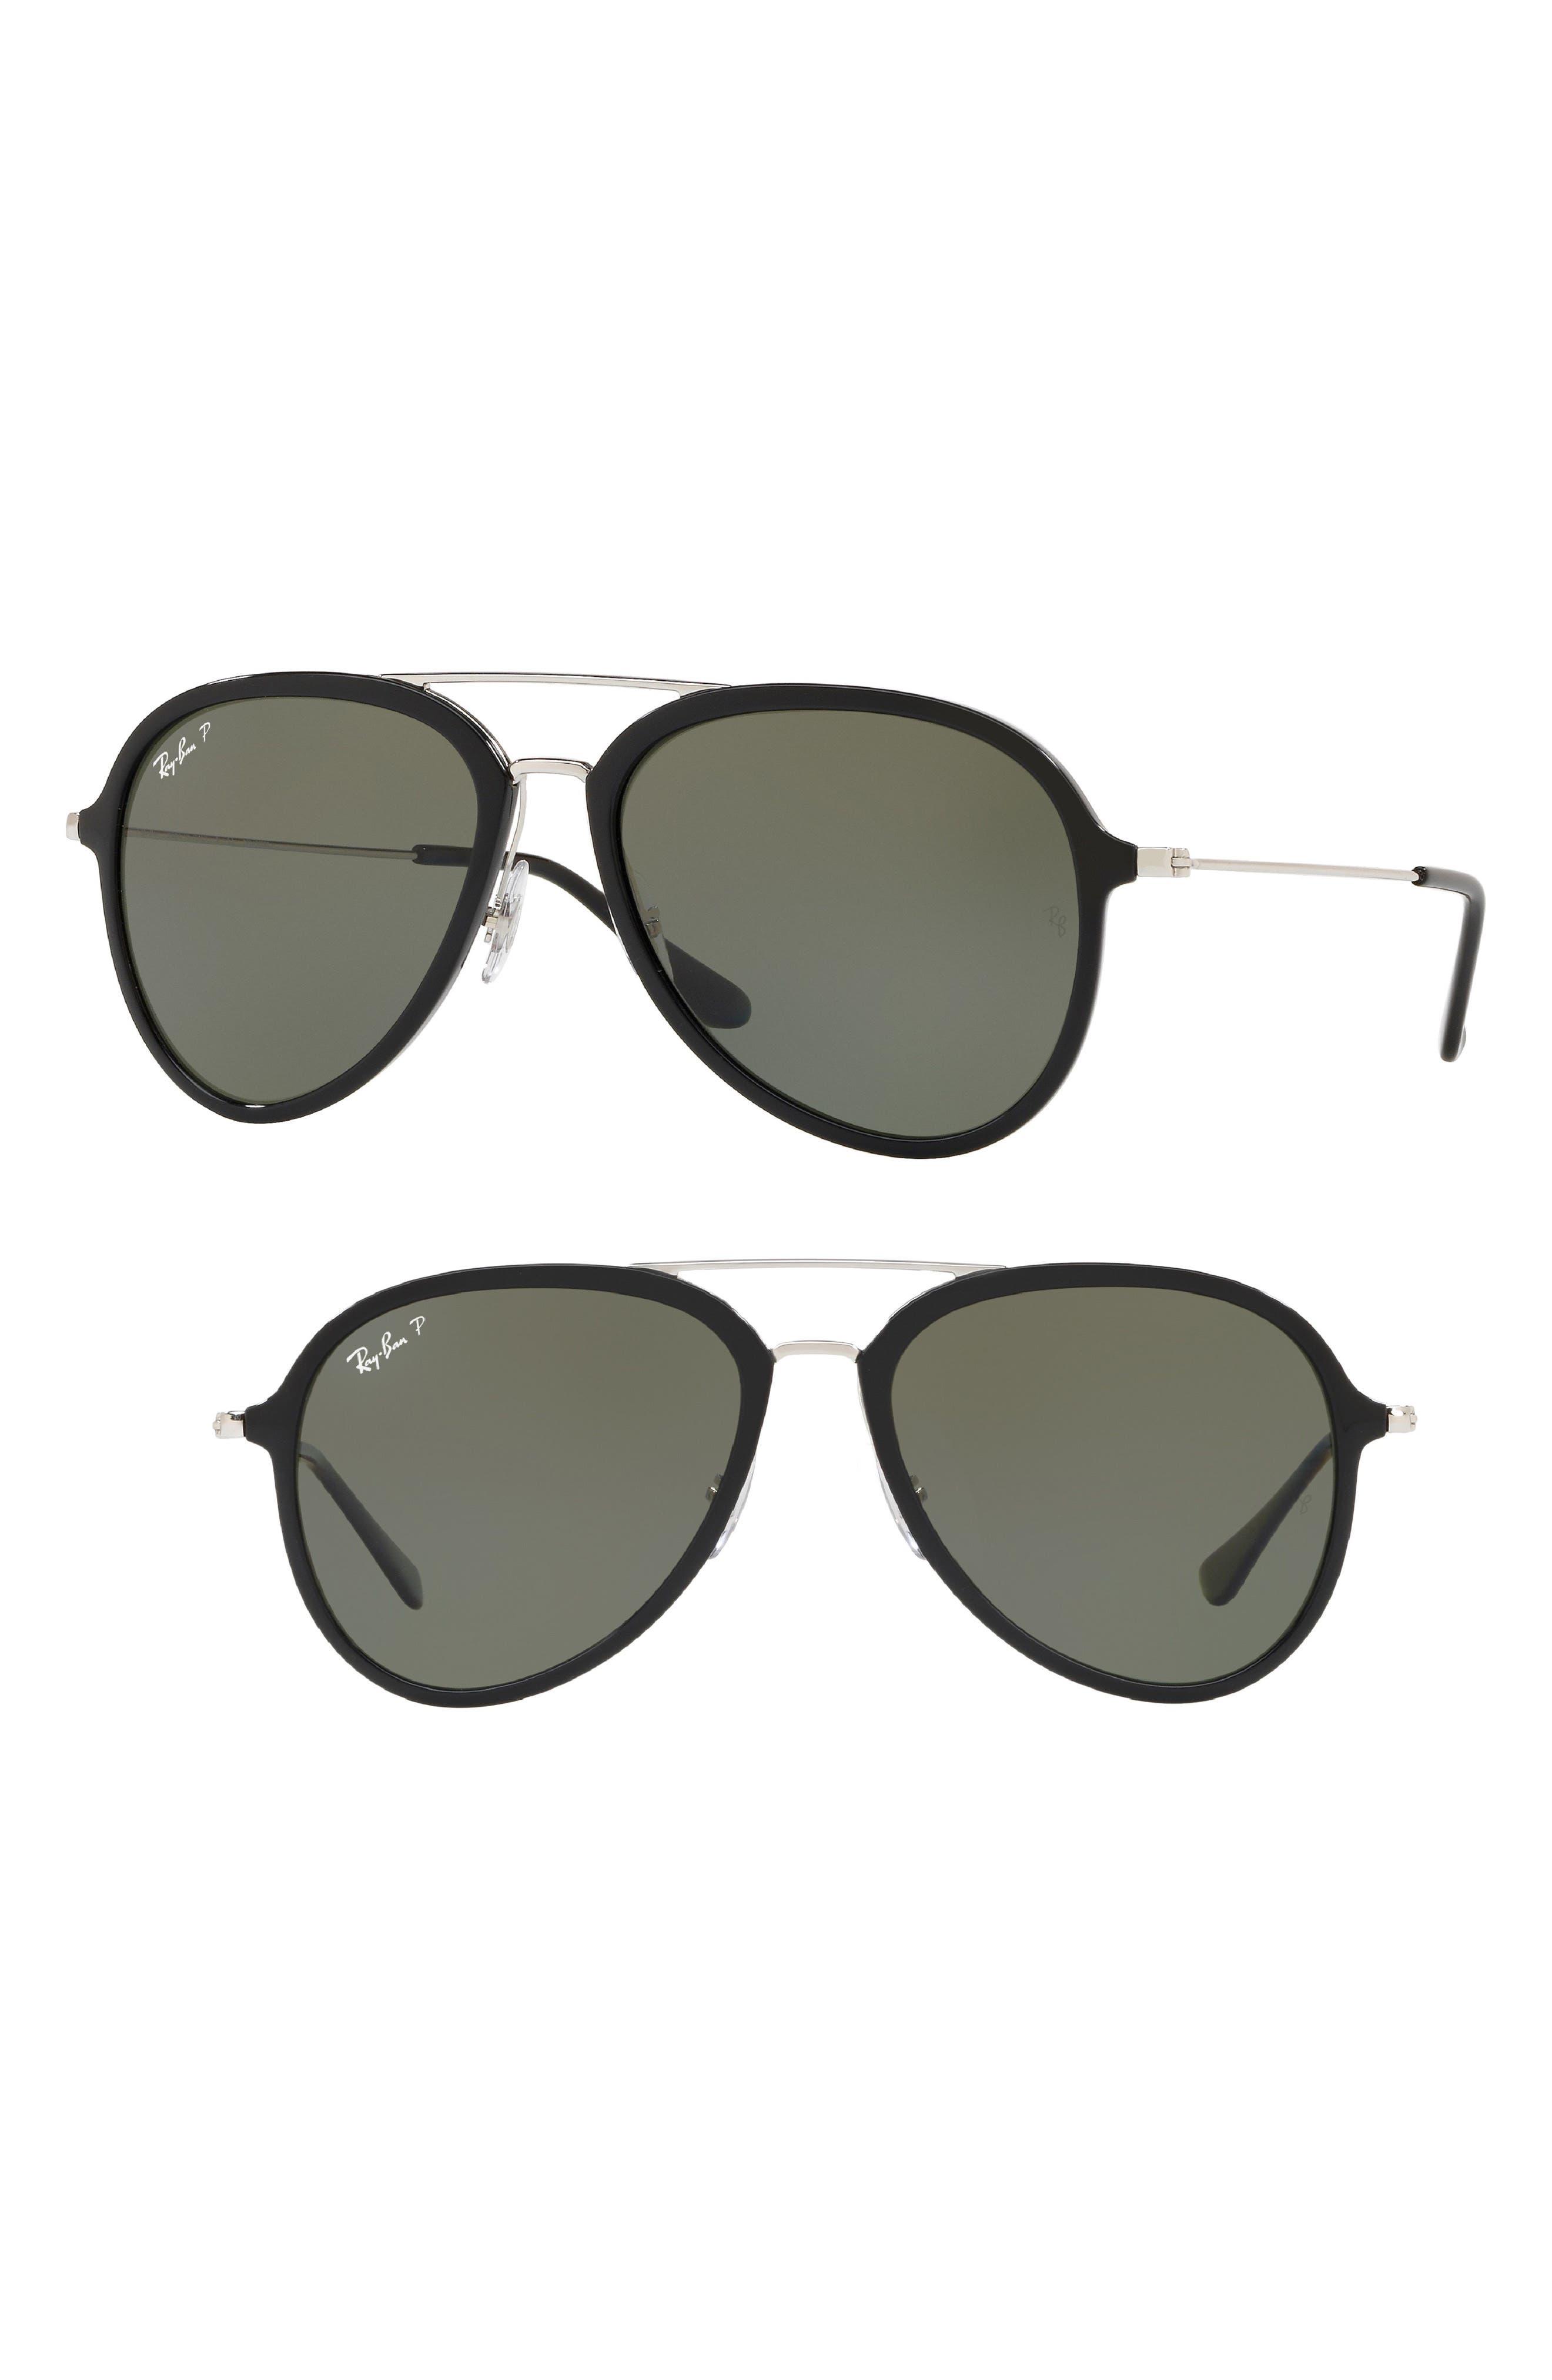 57mm Polarized Aviator Sunglasses,                             Main thumbnail 1, color,                             001